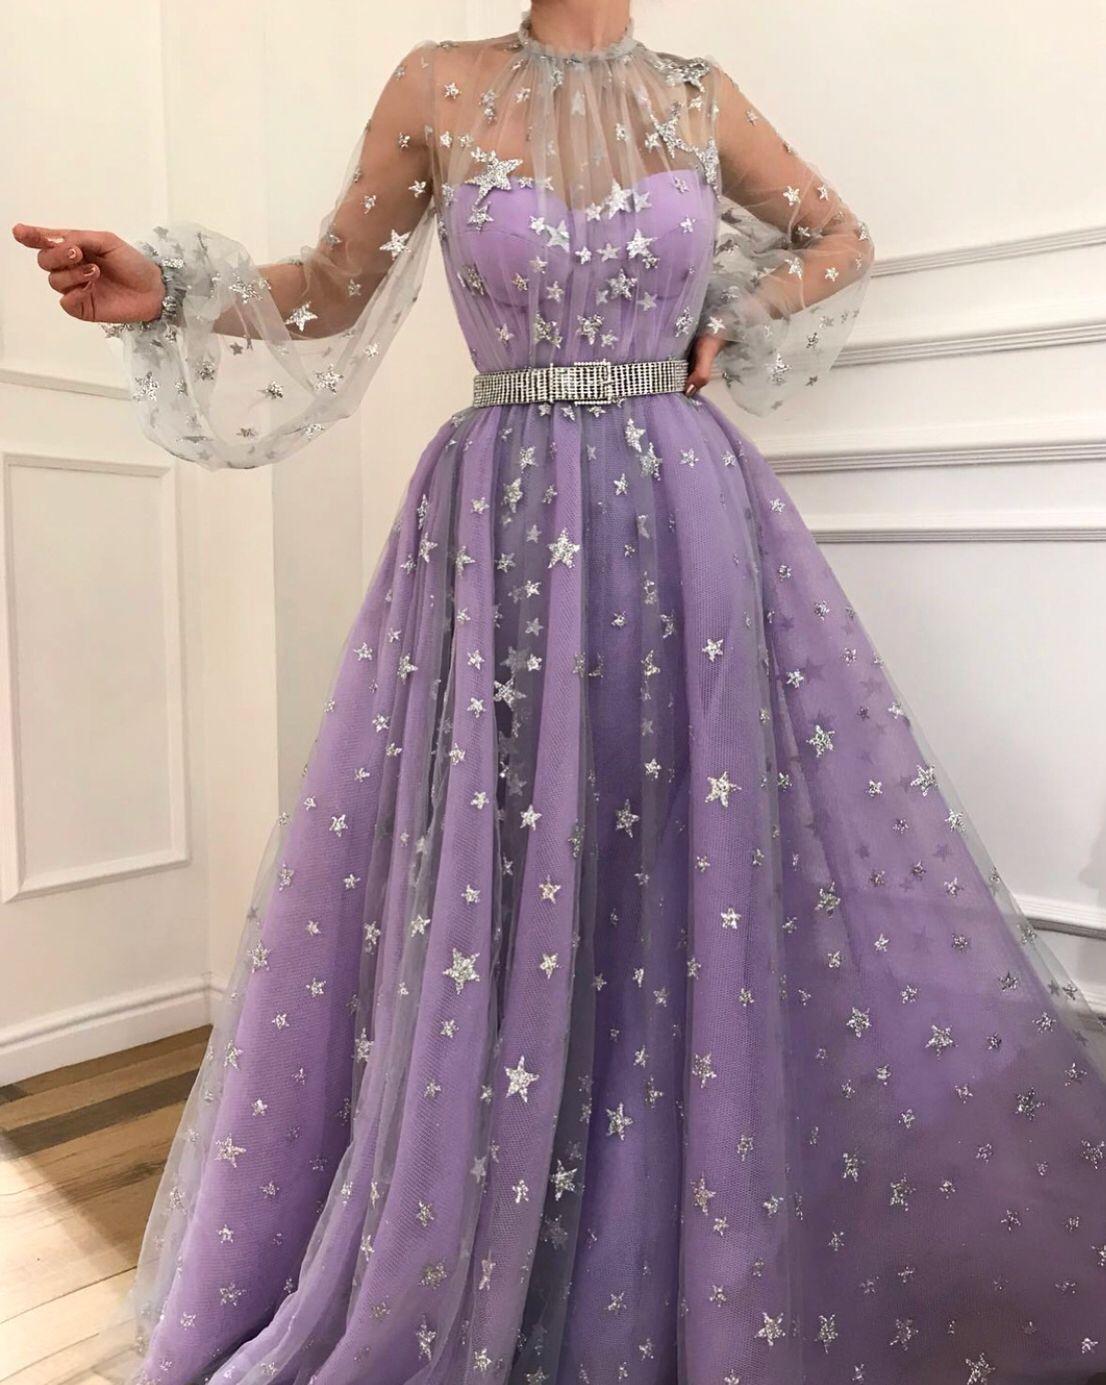 Purple Tulle Prom Dress Floor Length Prom Dress Prom Dresses Long With Sleeves Purple Prom Dress Evening Dresses Long [ 1385 x 1106 Pixel ]